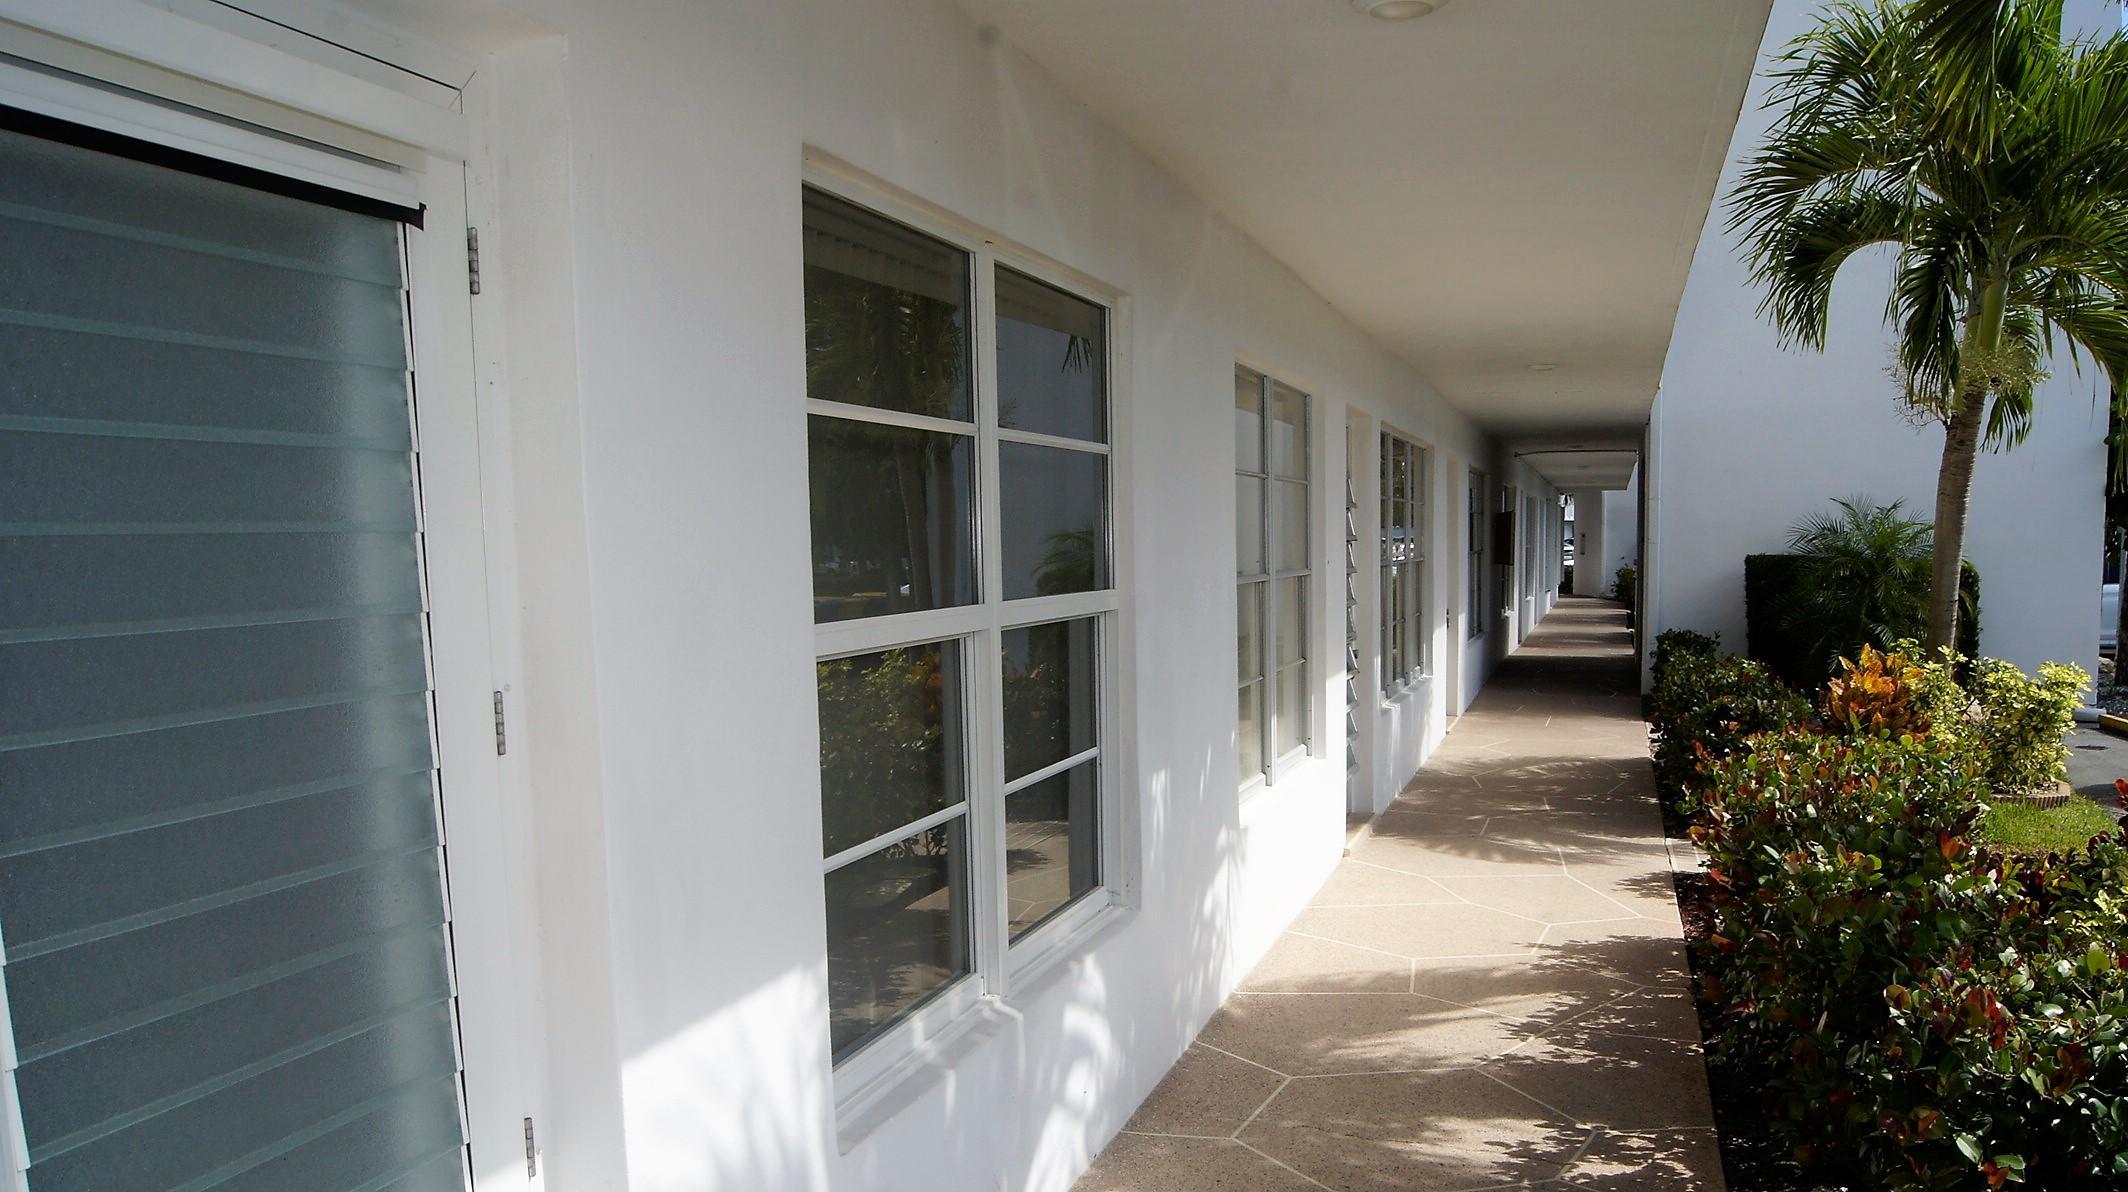 106 Wellington A, West Palm Beach, Florida 33417, 2 Bedrooms Bedrooms, ,2 BathroomsBathrooms,Condo/Coop,For Sale,WELLINGTON,Wellington A,1,RX-10501555